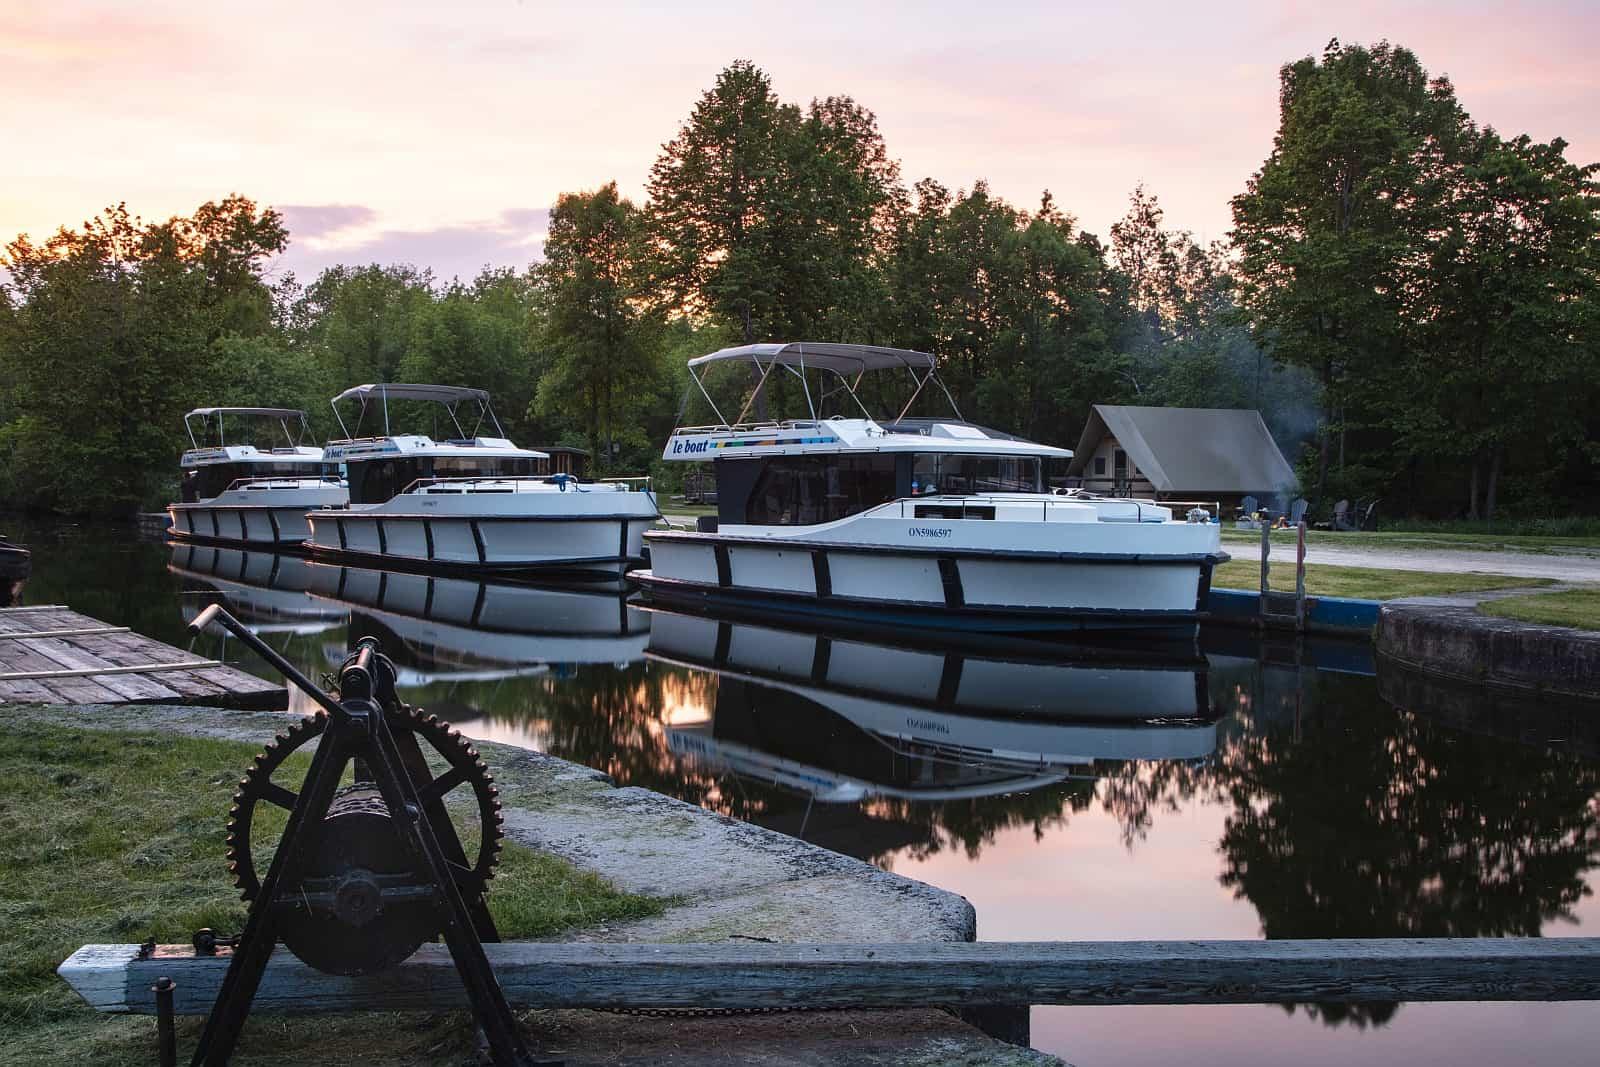 Eine komfortable und luxuriöse Hausbootflotte. Foto Le Boat